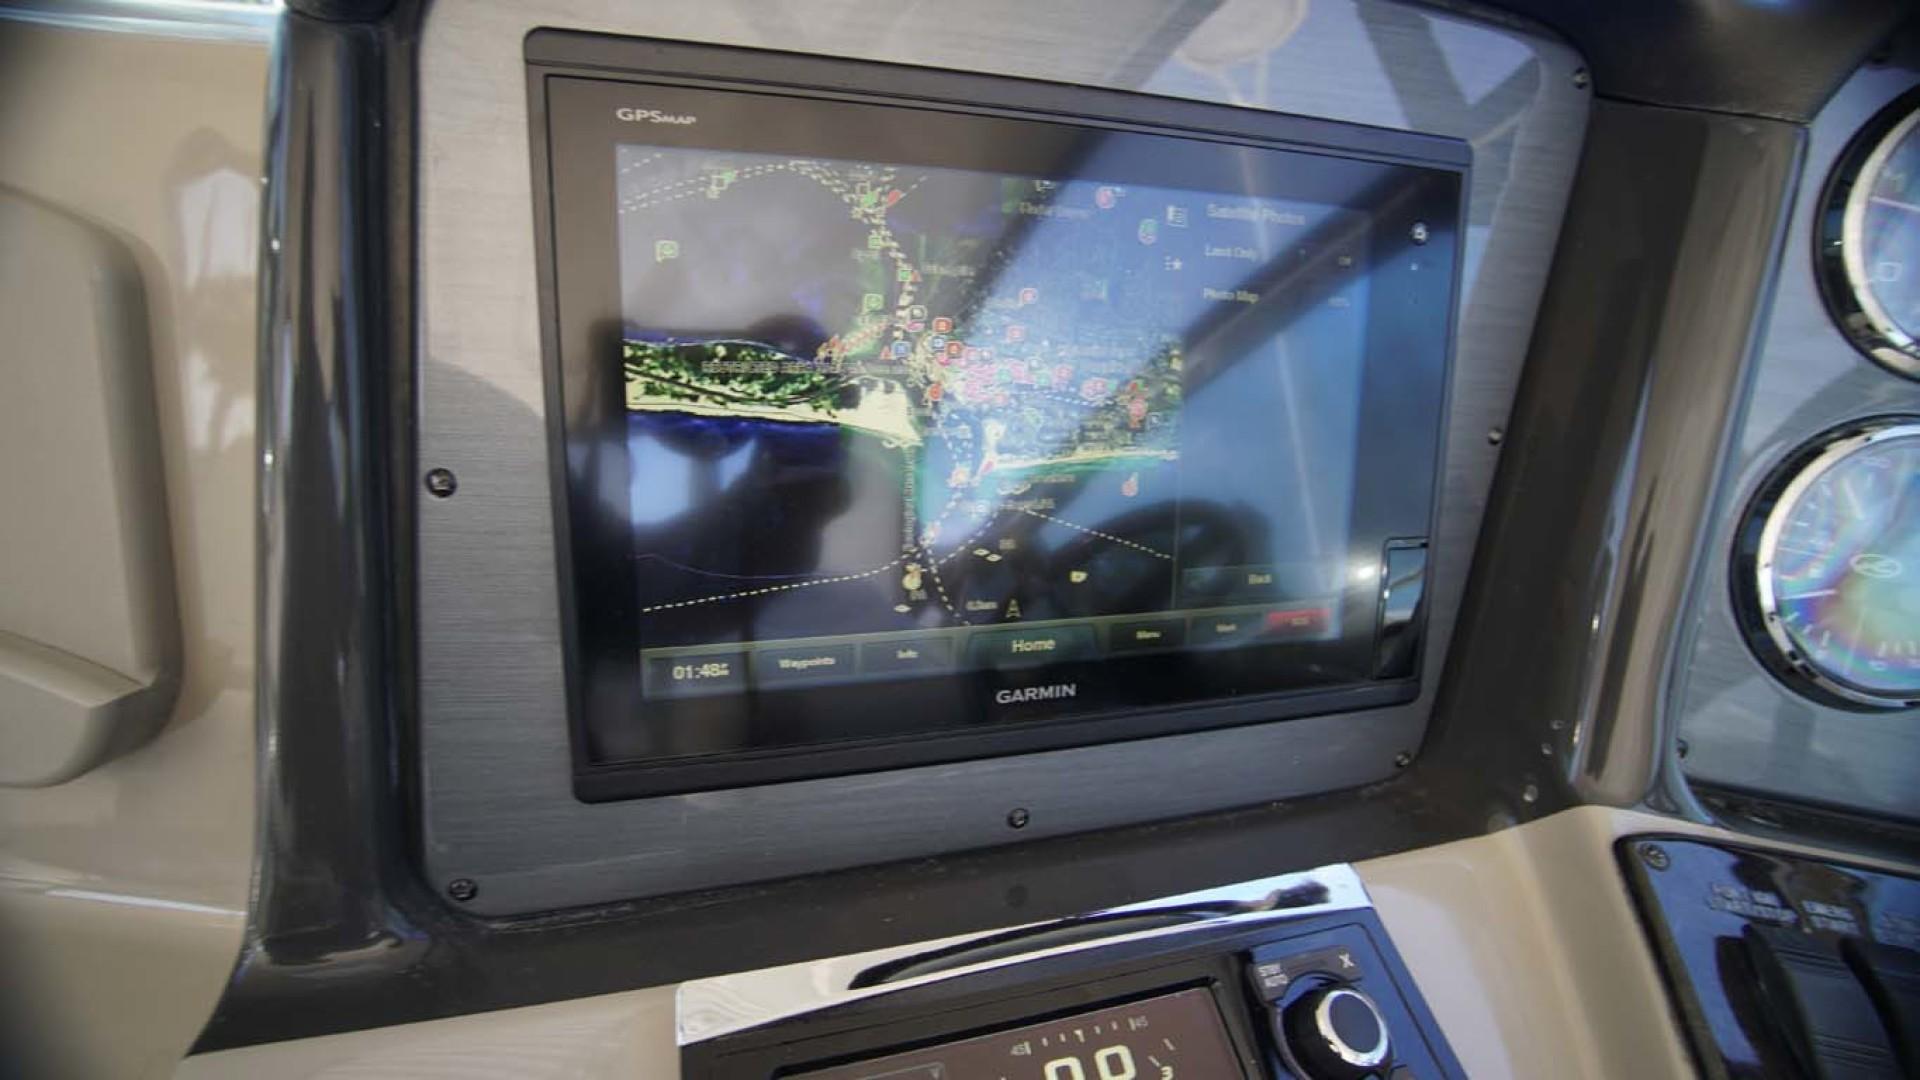 Sea Ray-Sundancer 2006-Late Fee Destin-Florida-United States-Garmin Screen-1125994 | Thumbnail